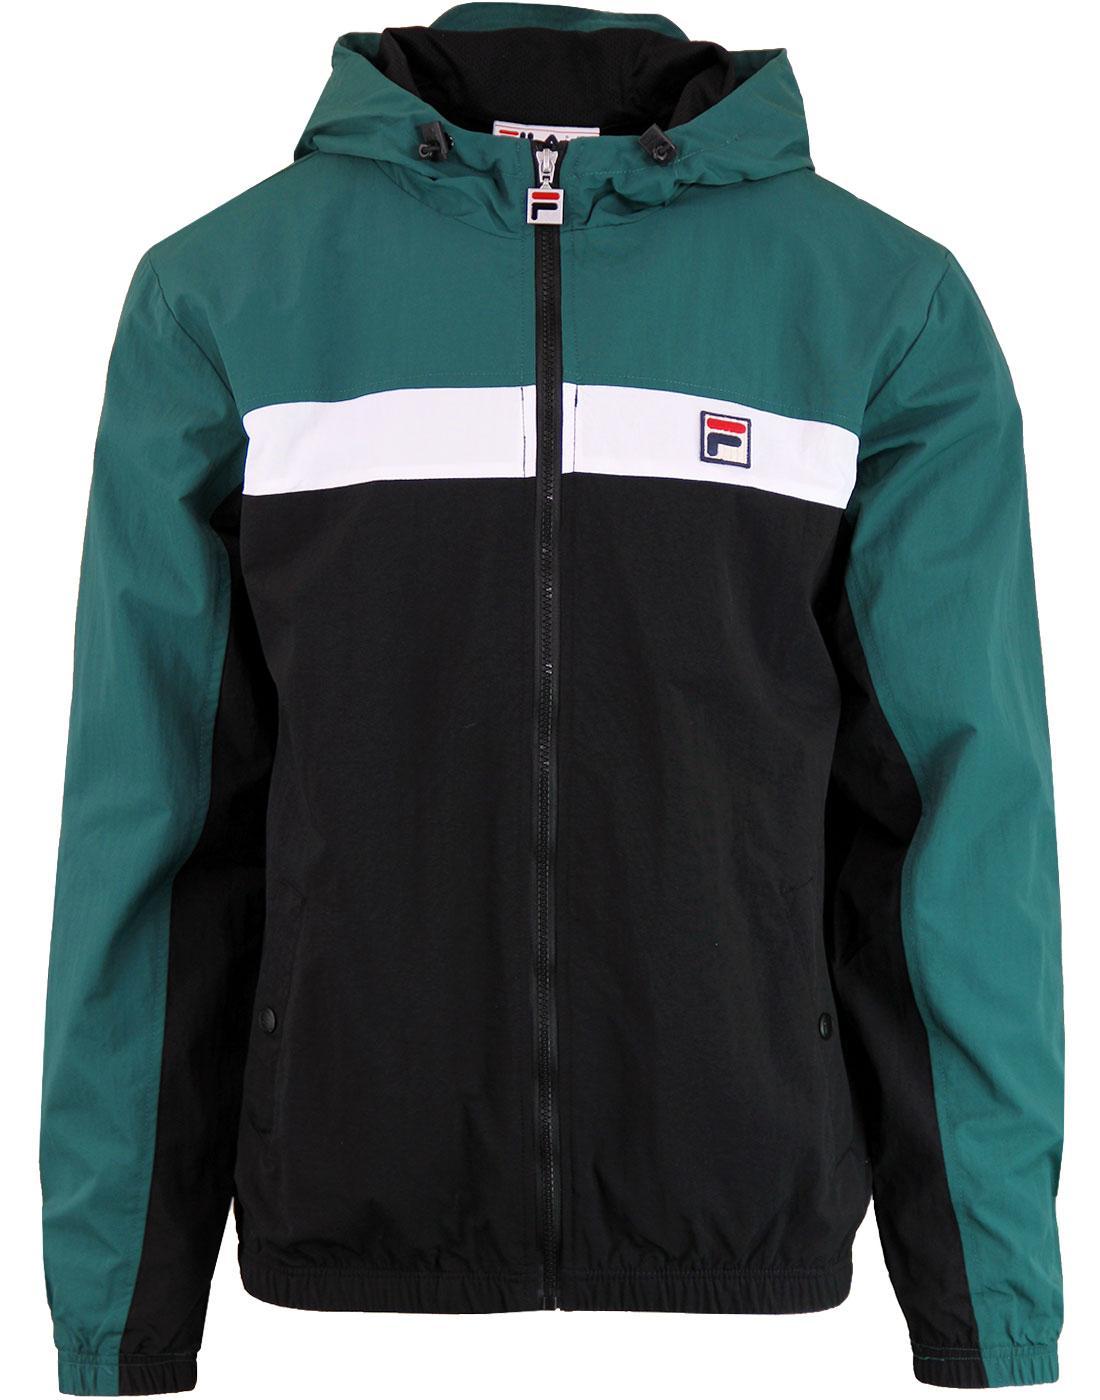 FILA VINTAGE Clipper Retro Stripe Hooded Jacket B